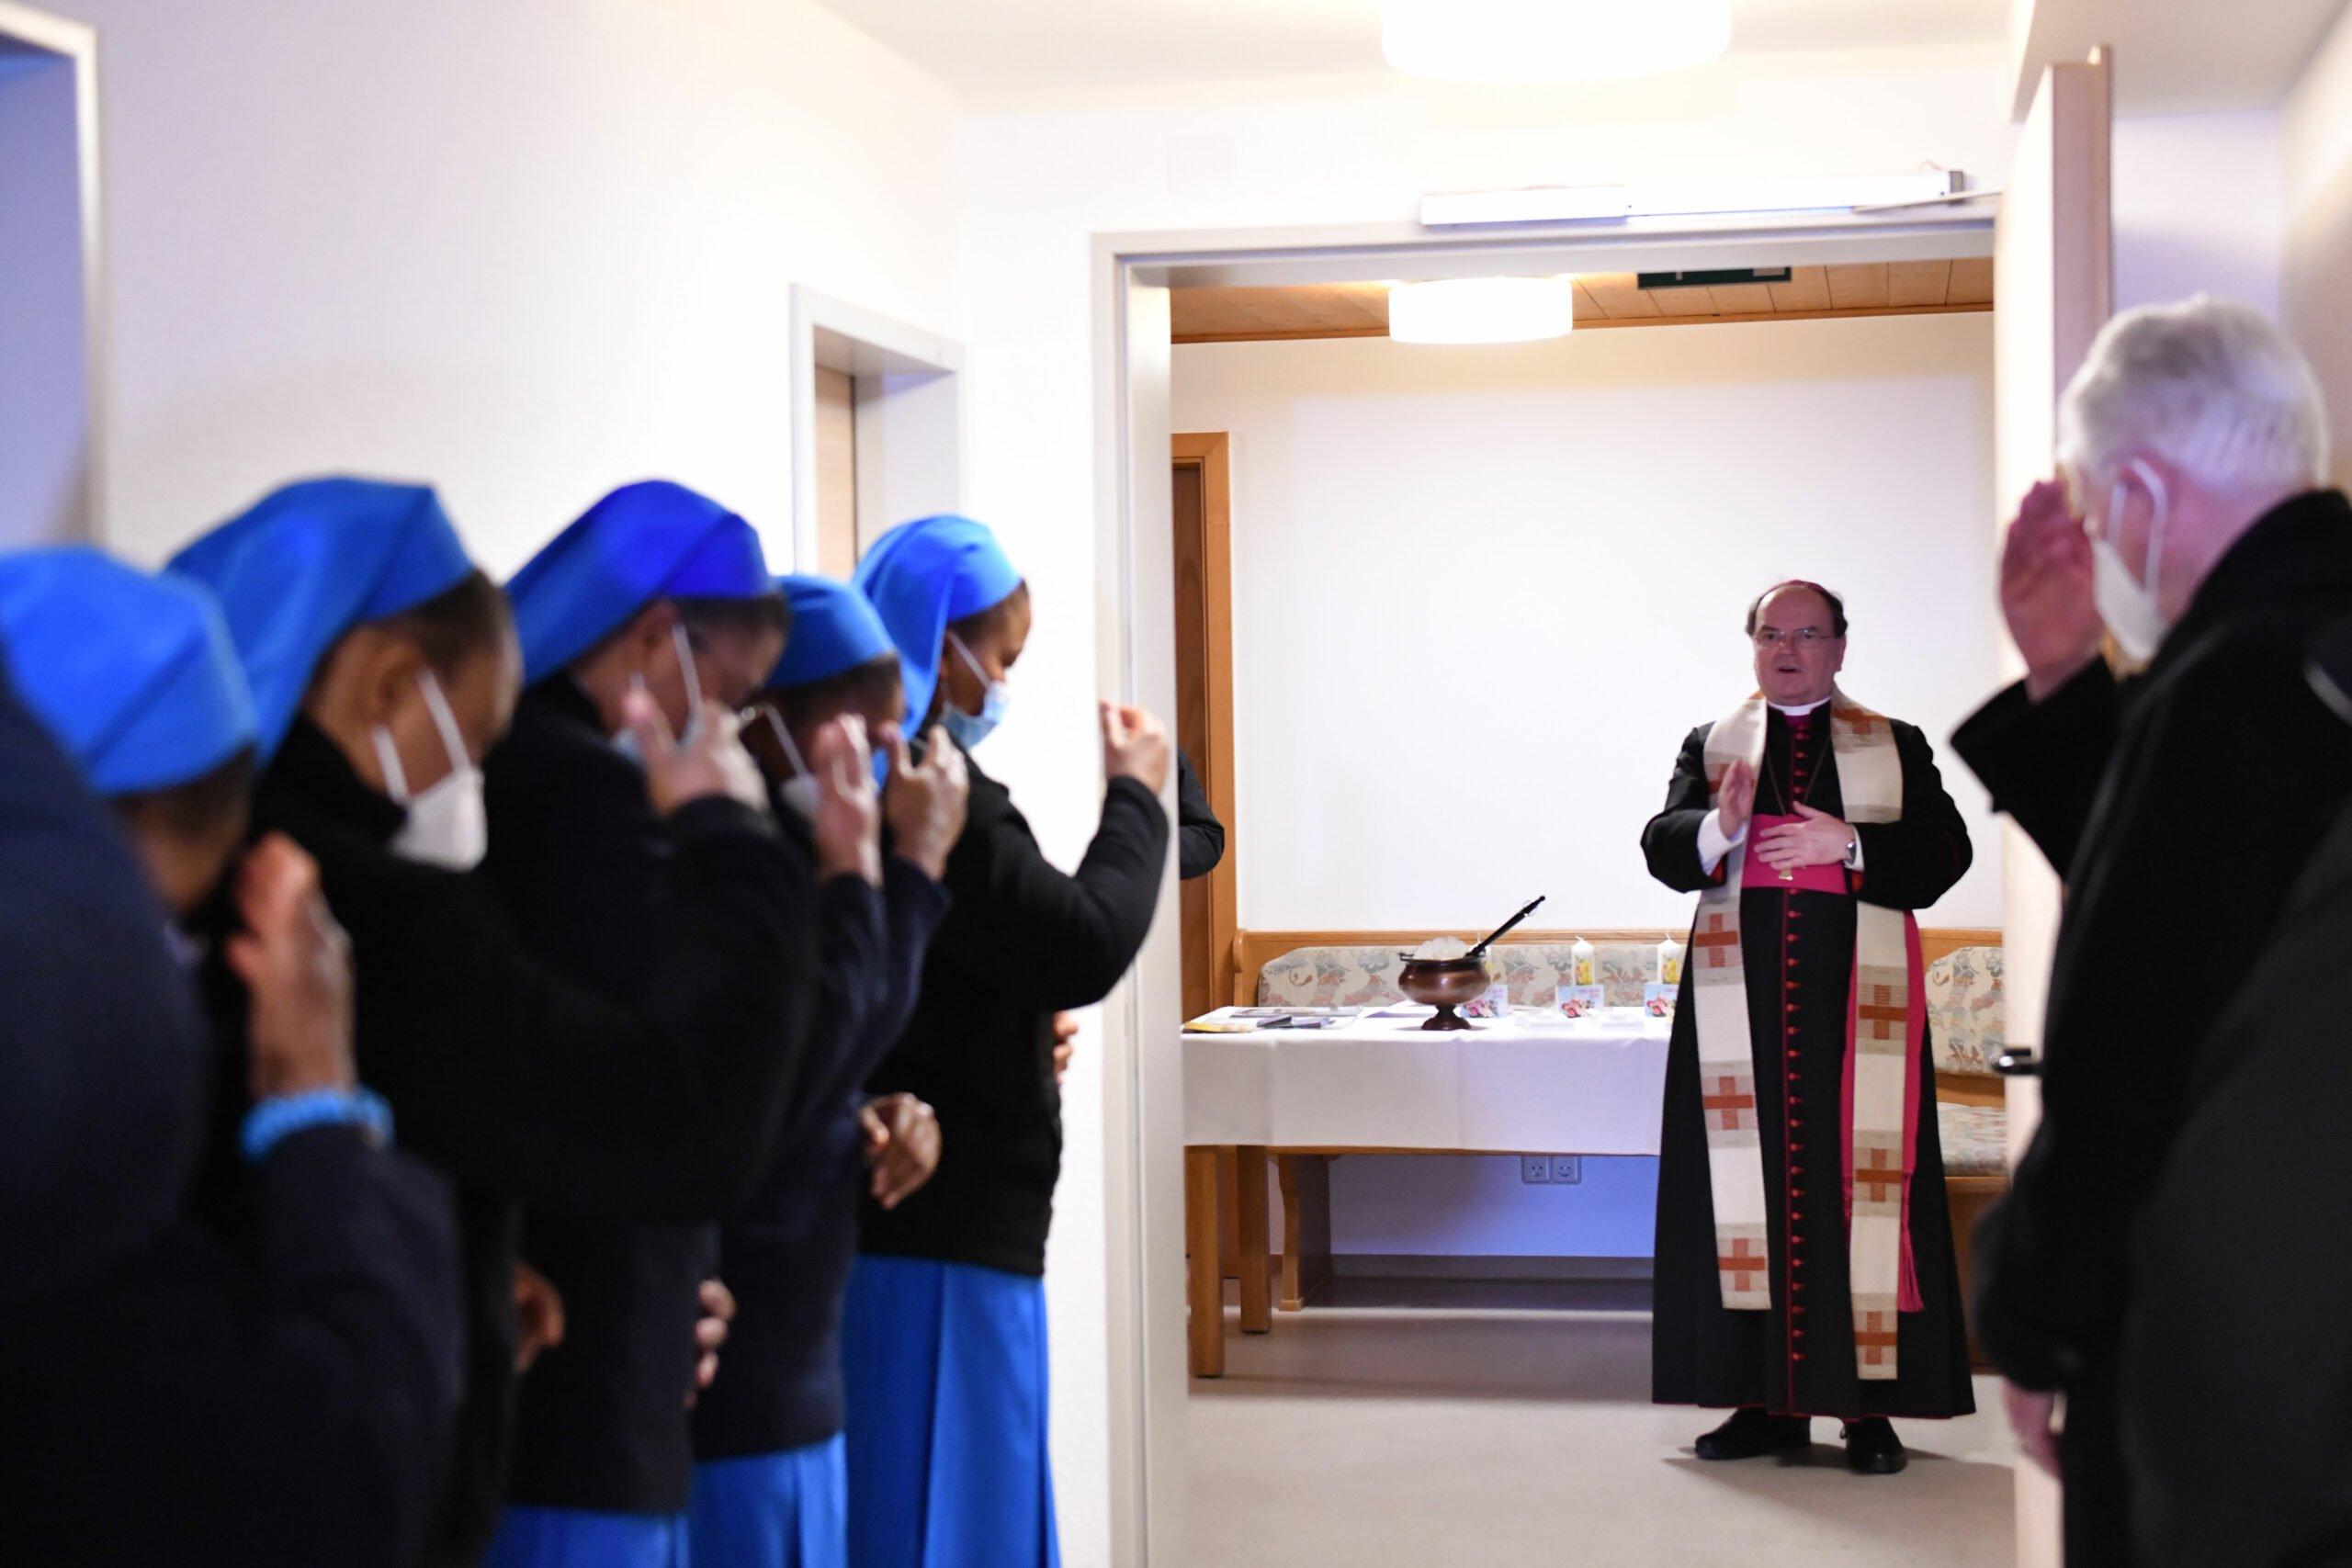 Bischof Bertram Segnet Die Neuen Raeumlichkeiten Des Konvents Foto Julian Schmidt Pba Scaled